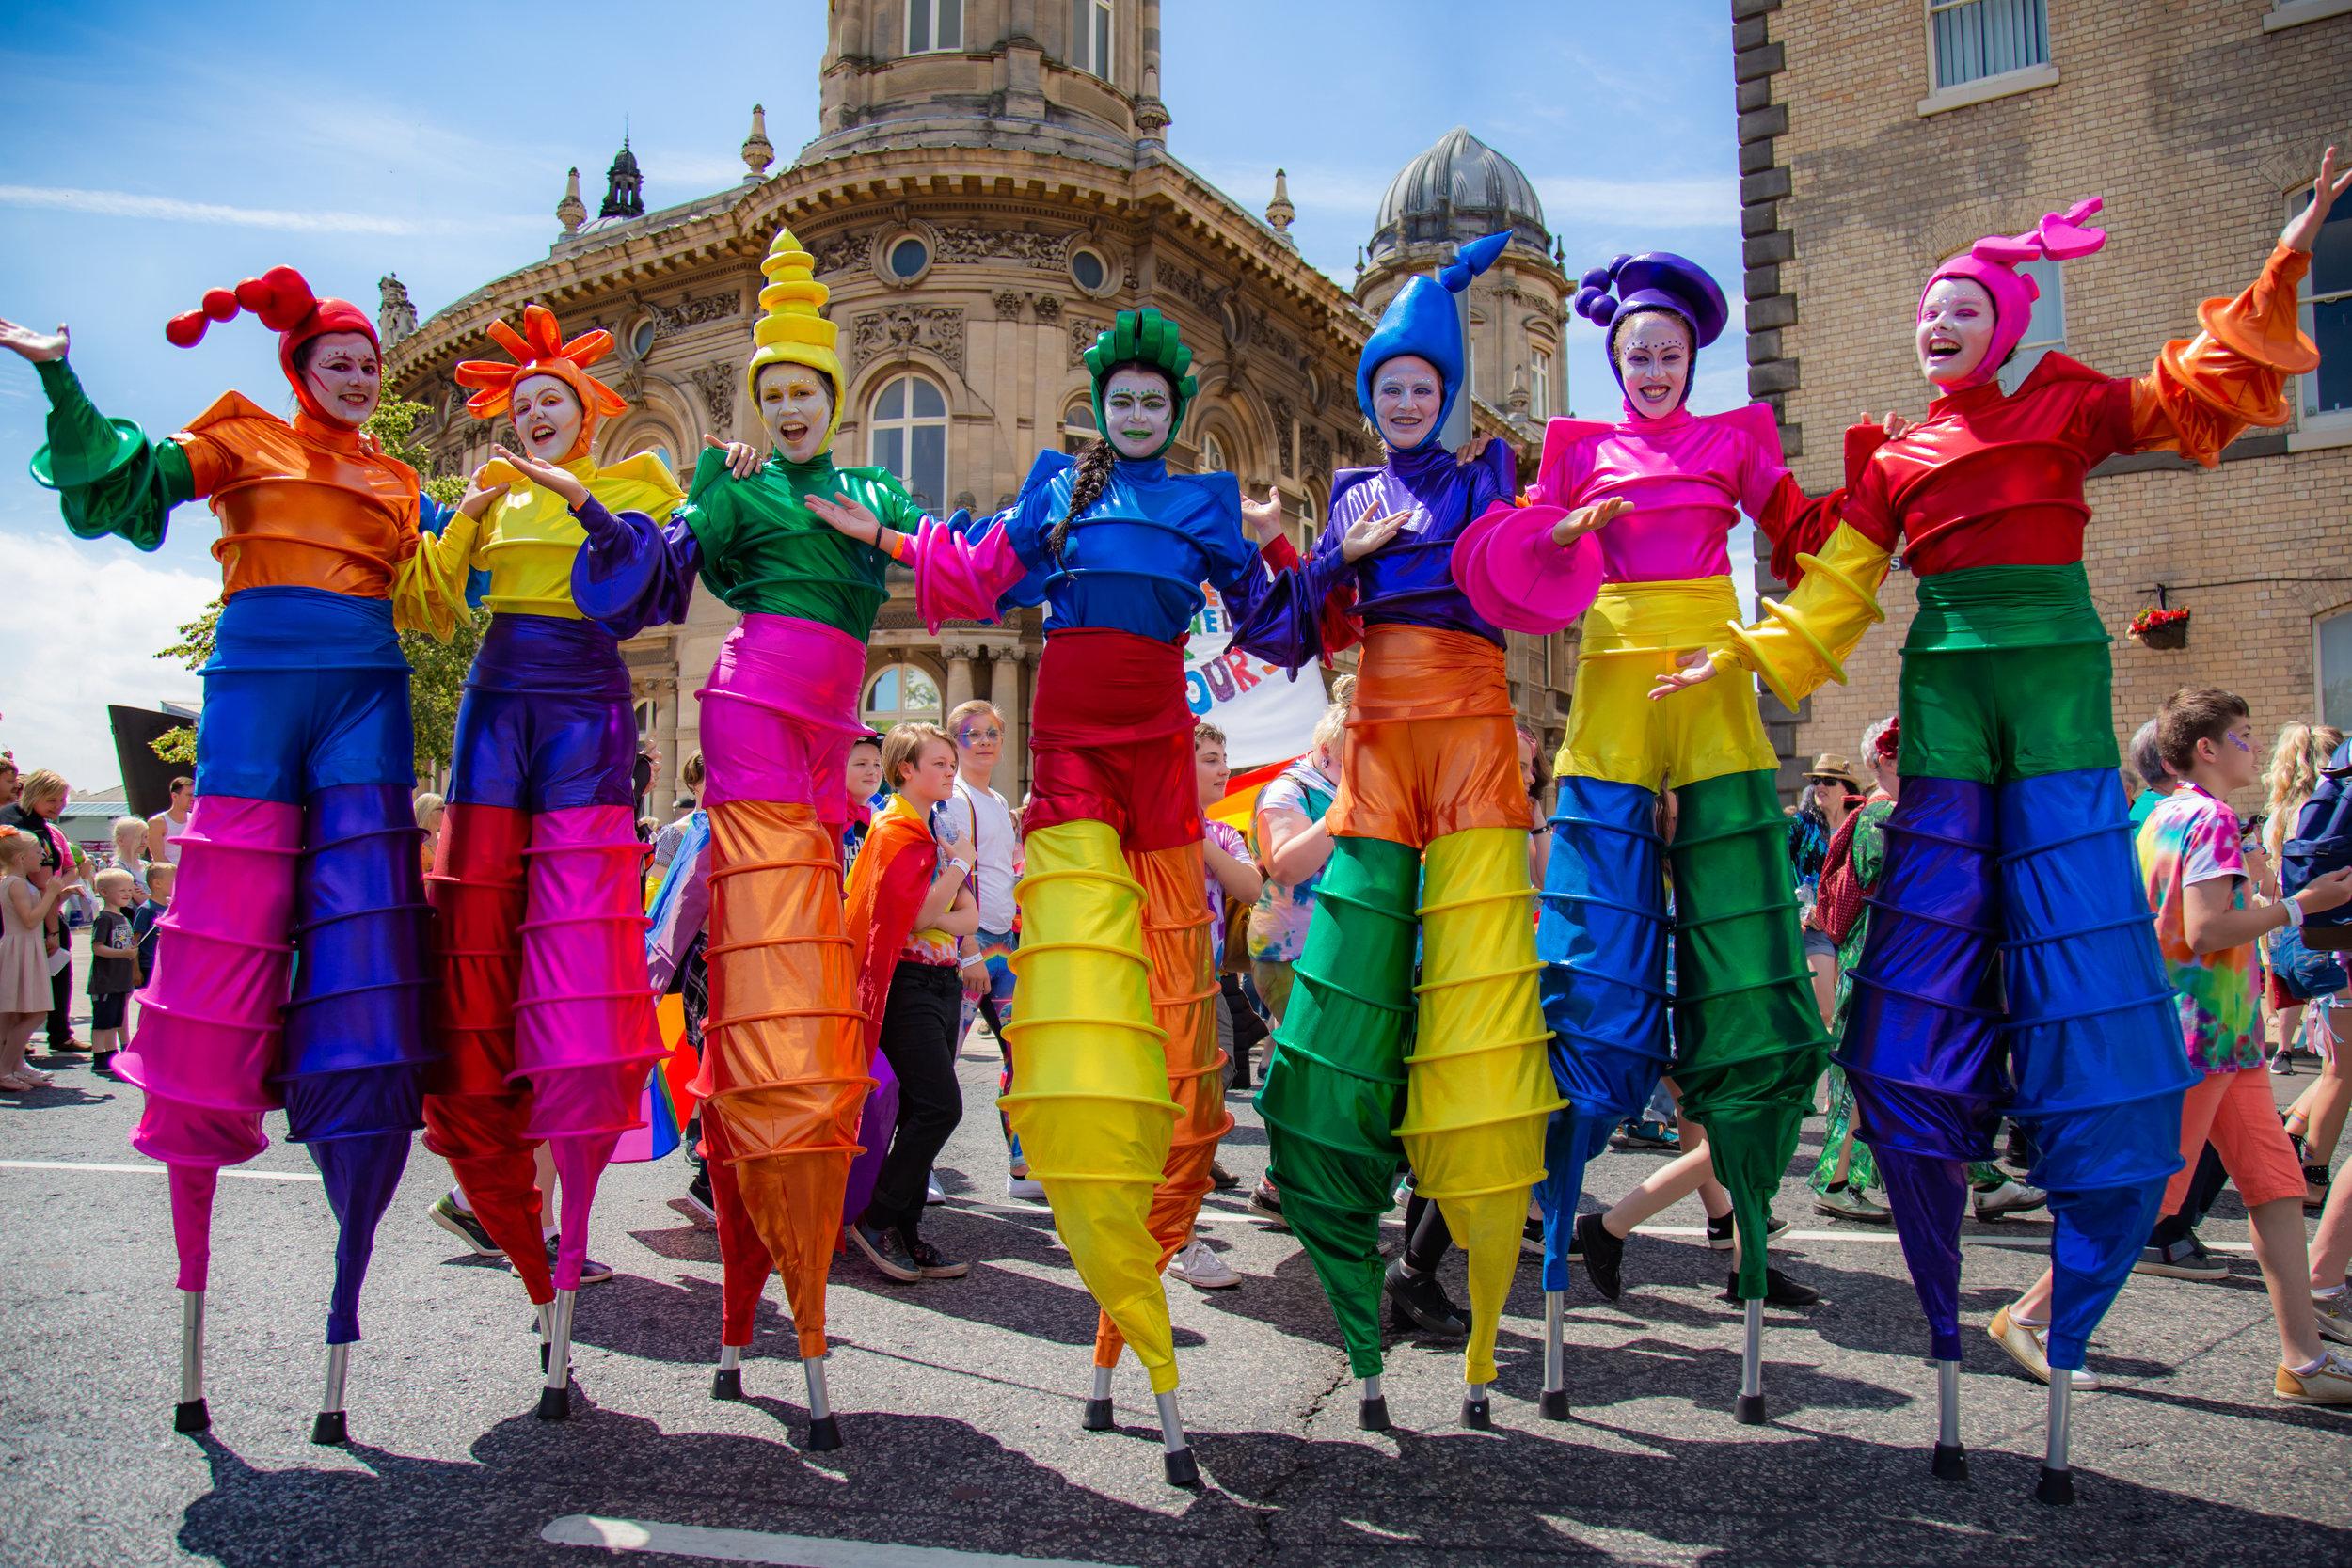 The Carnival Stilt Dancers